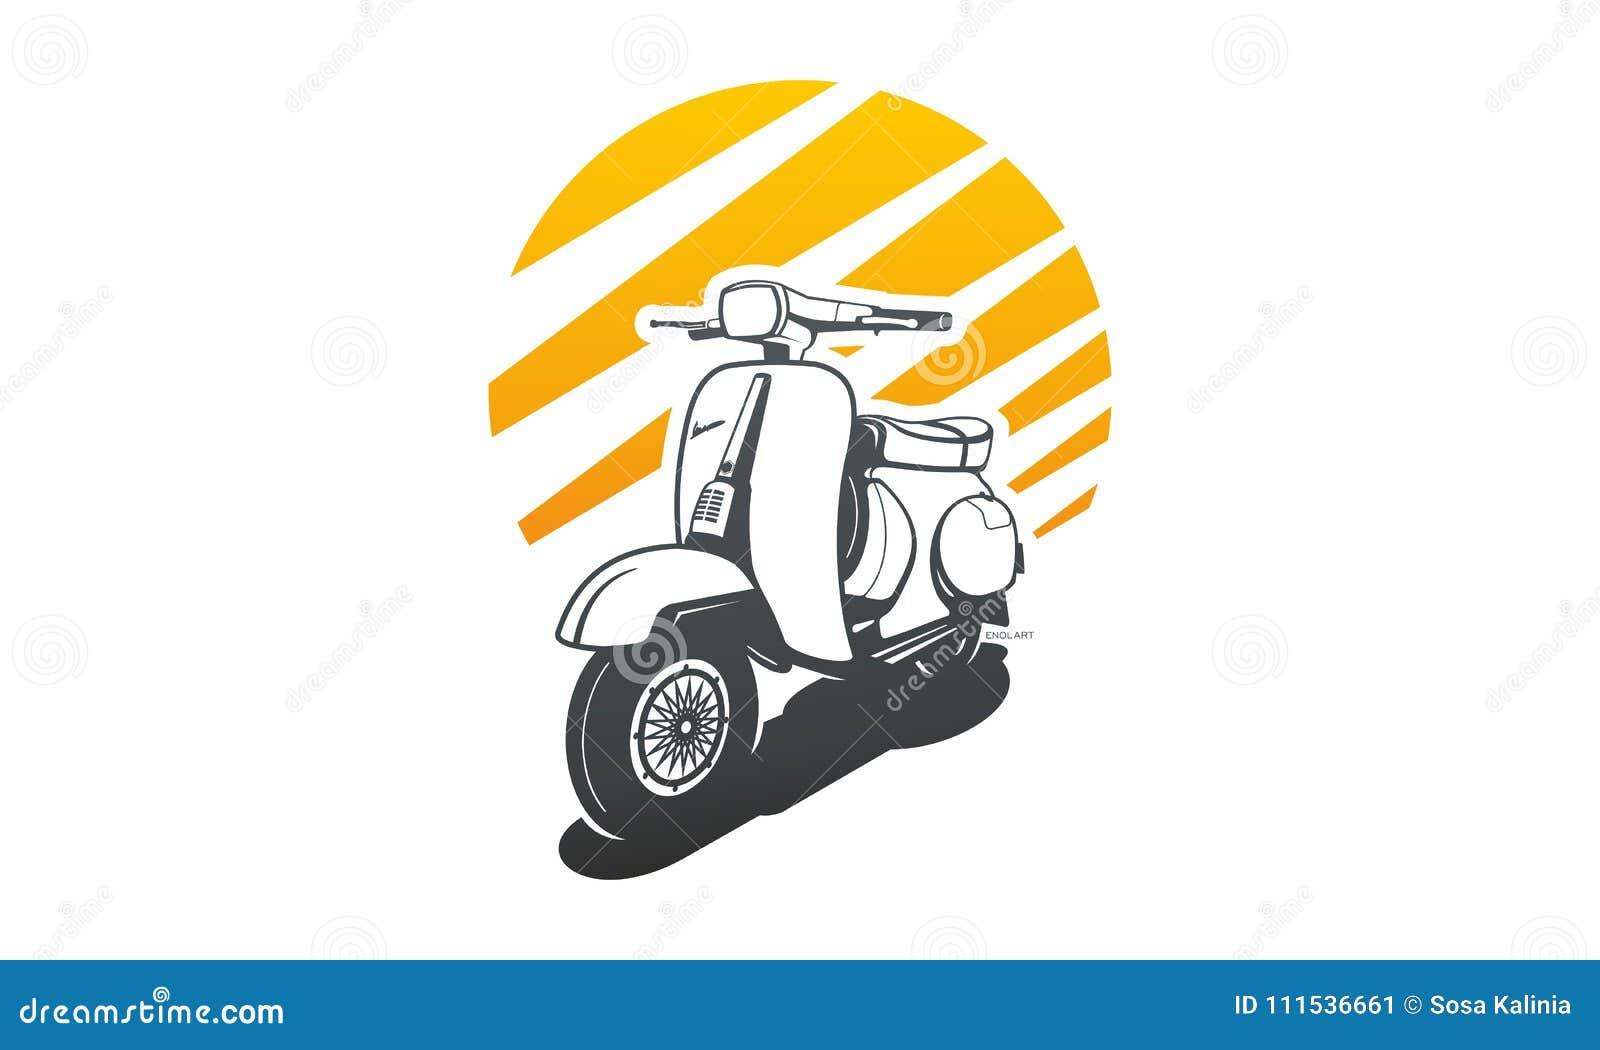 Motorcycle Retro Unique Logo Oldschool Stock Illustration Illustration Of Transport Scooter 111536661